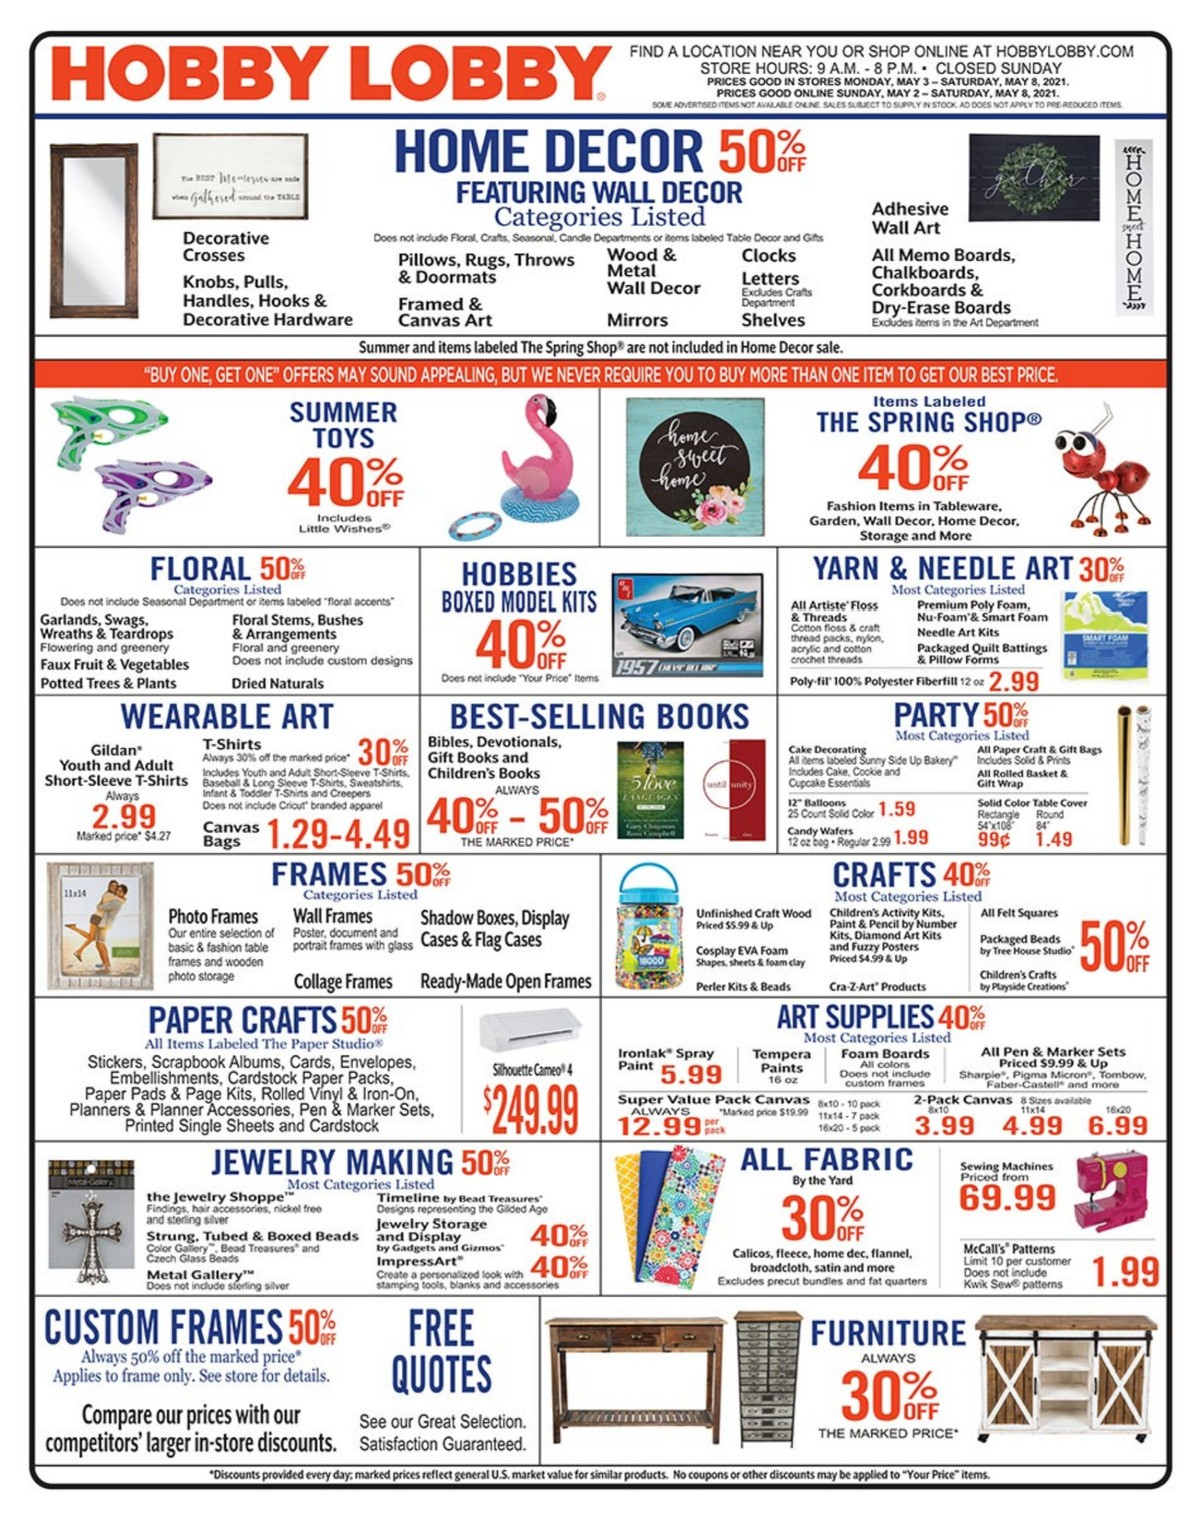 Hobby Lobby Weekly Ad from May 2